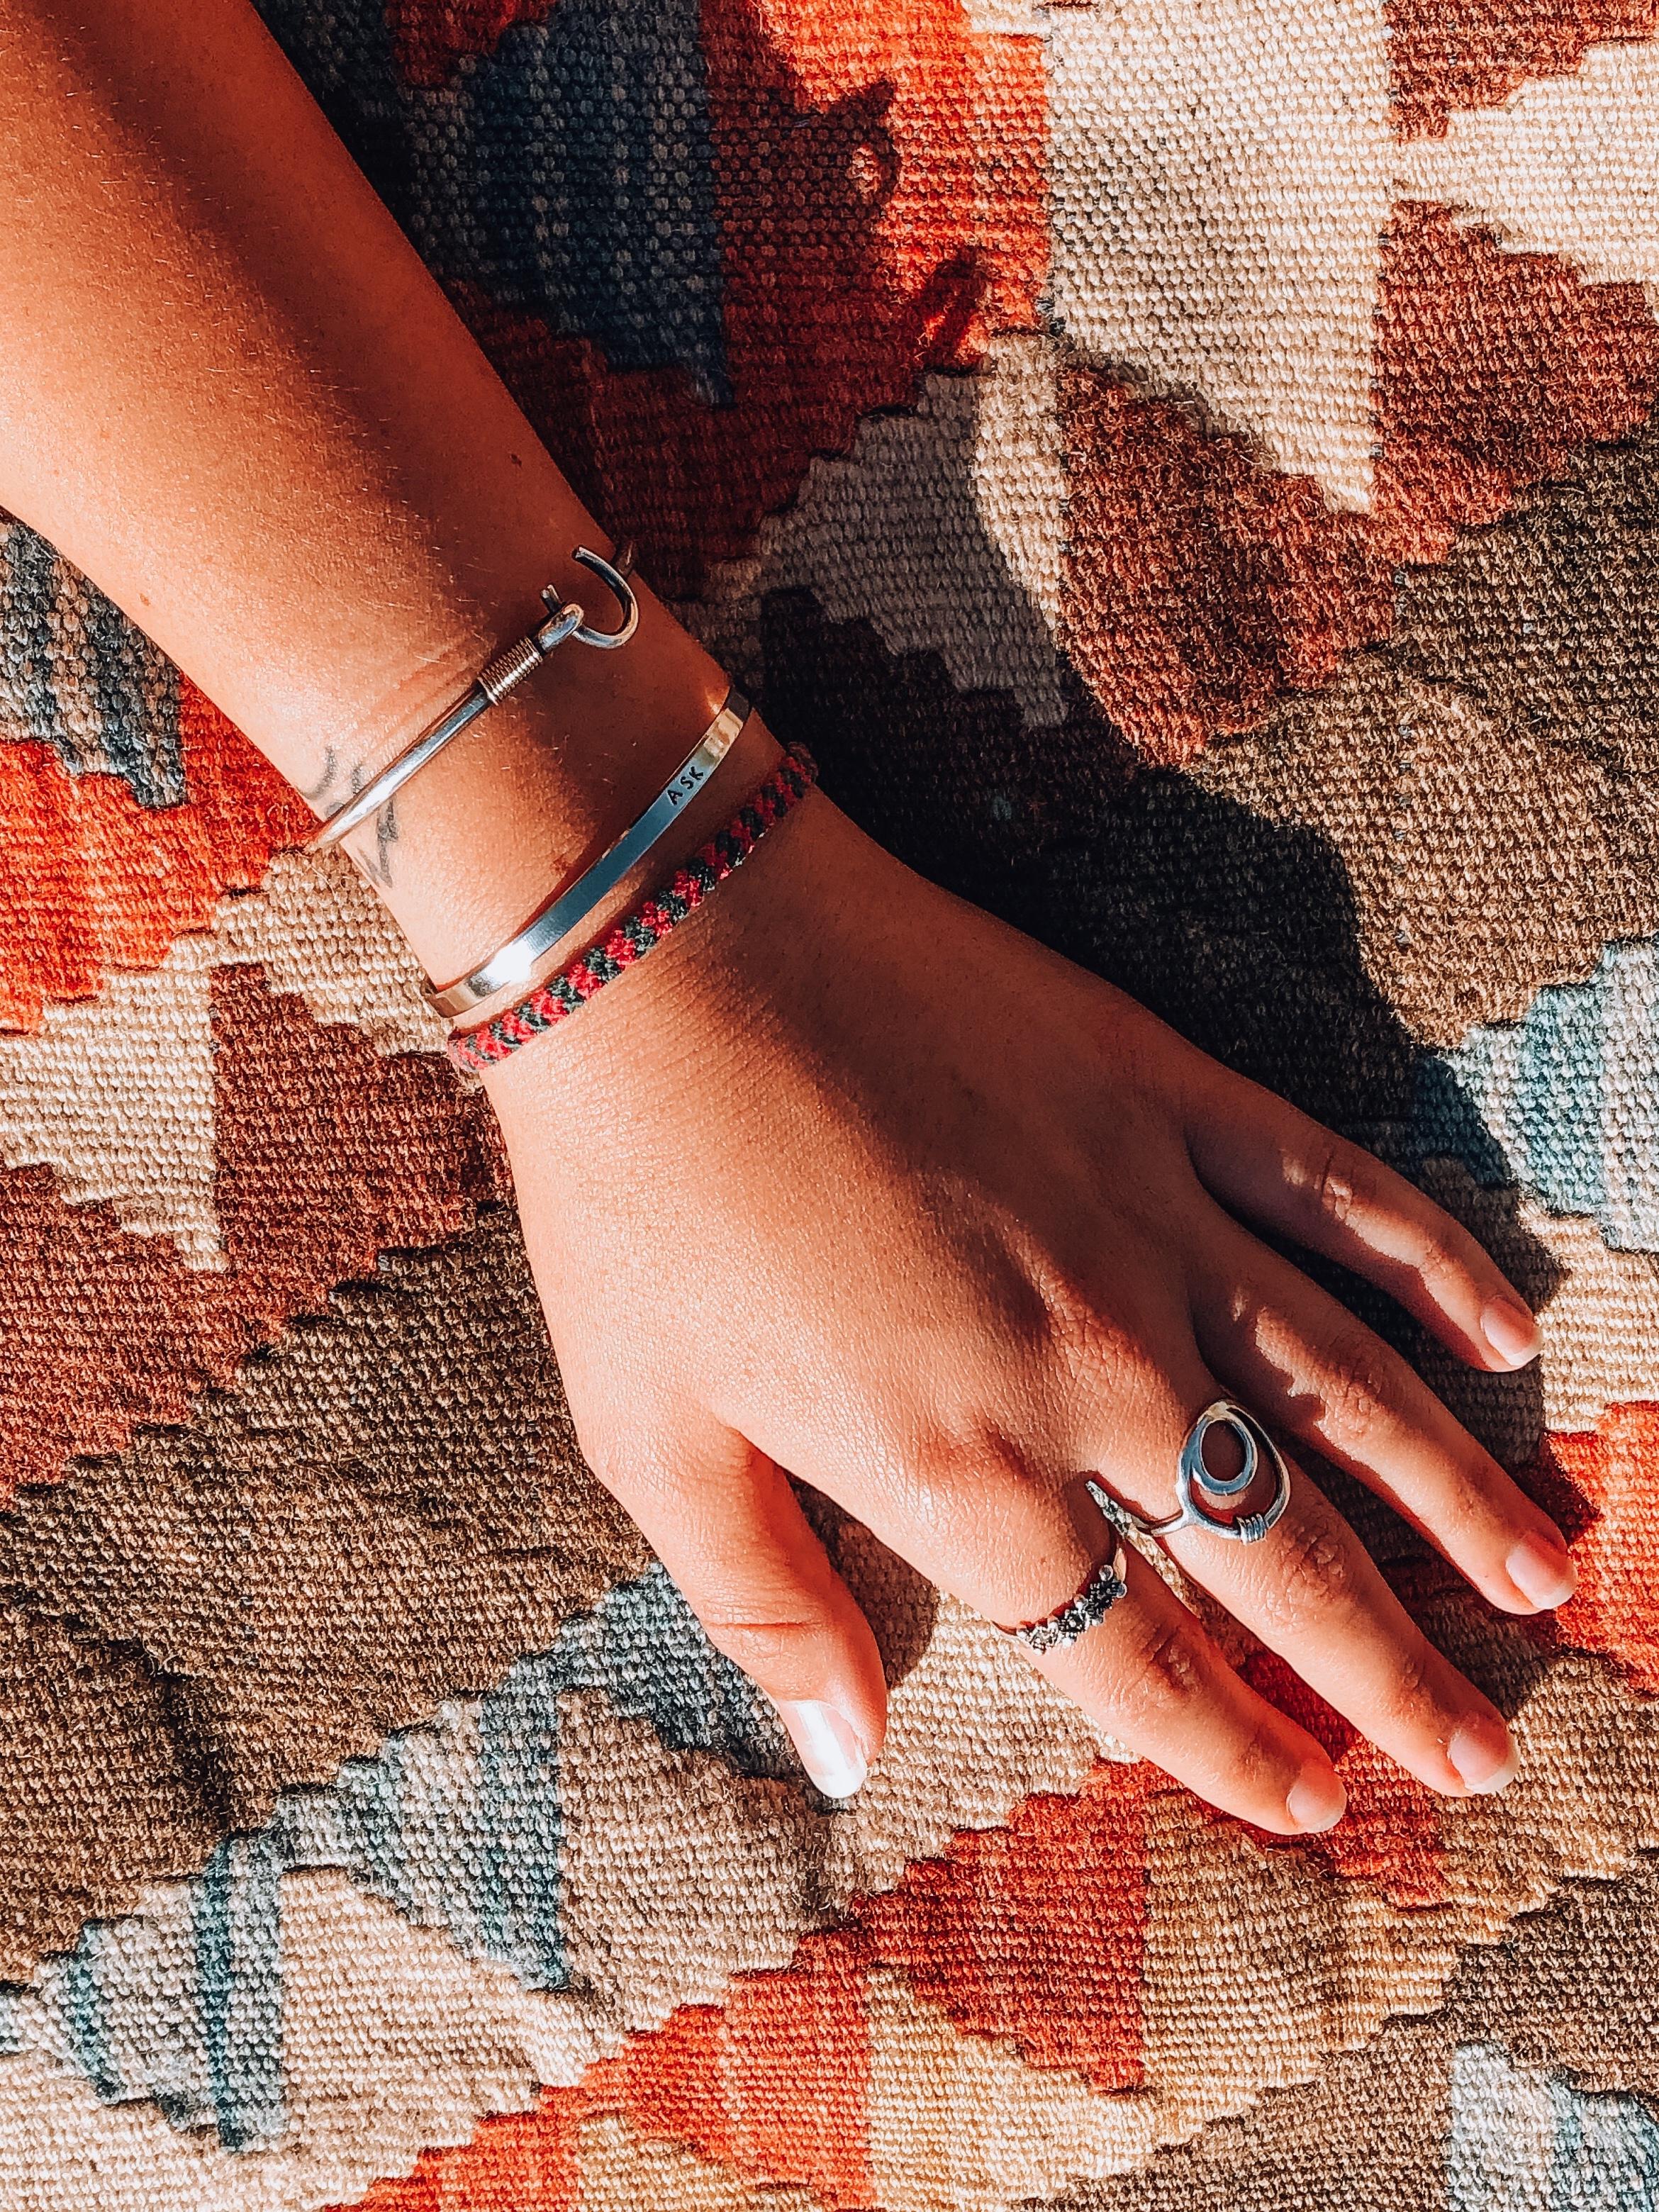 Bracelets by Tumble